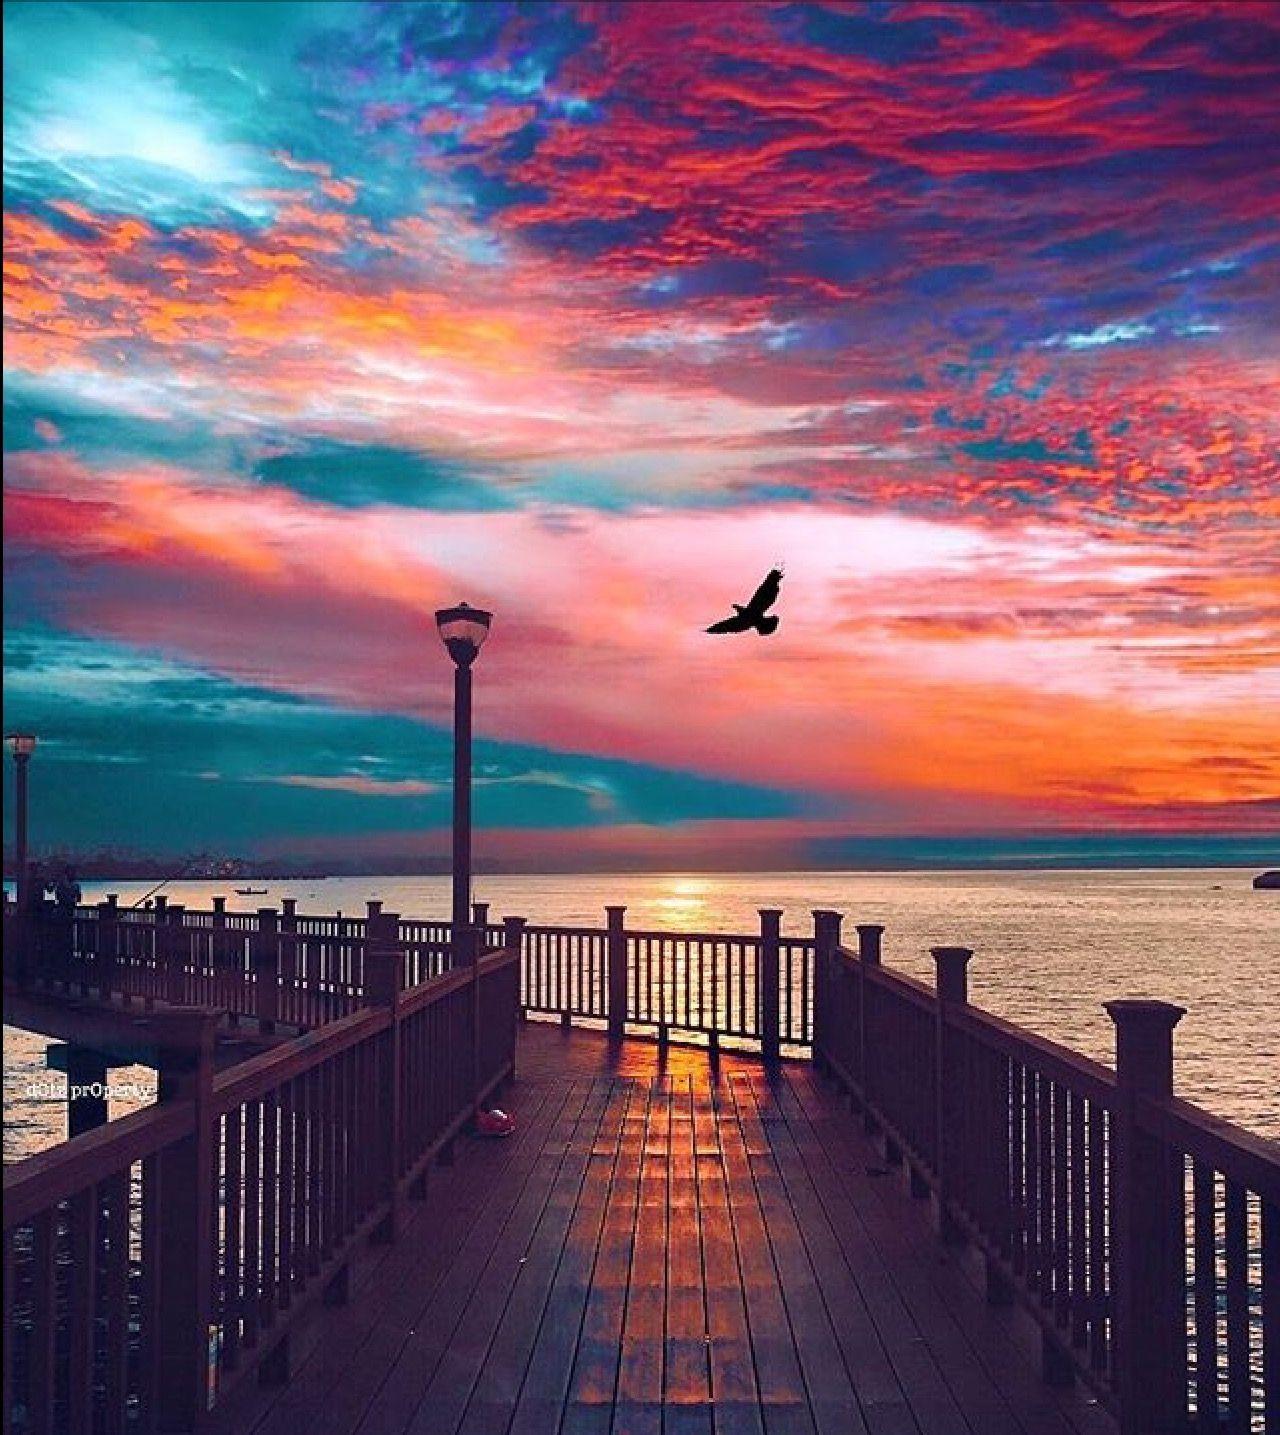 Pin By Sofiya Aleksandrova On Sunsets Beautiful Landscapes Landscape Photography Nature Pictures